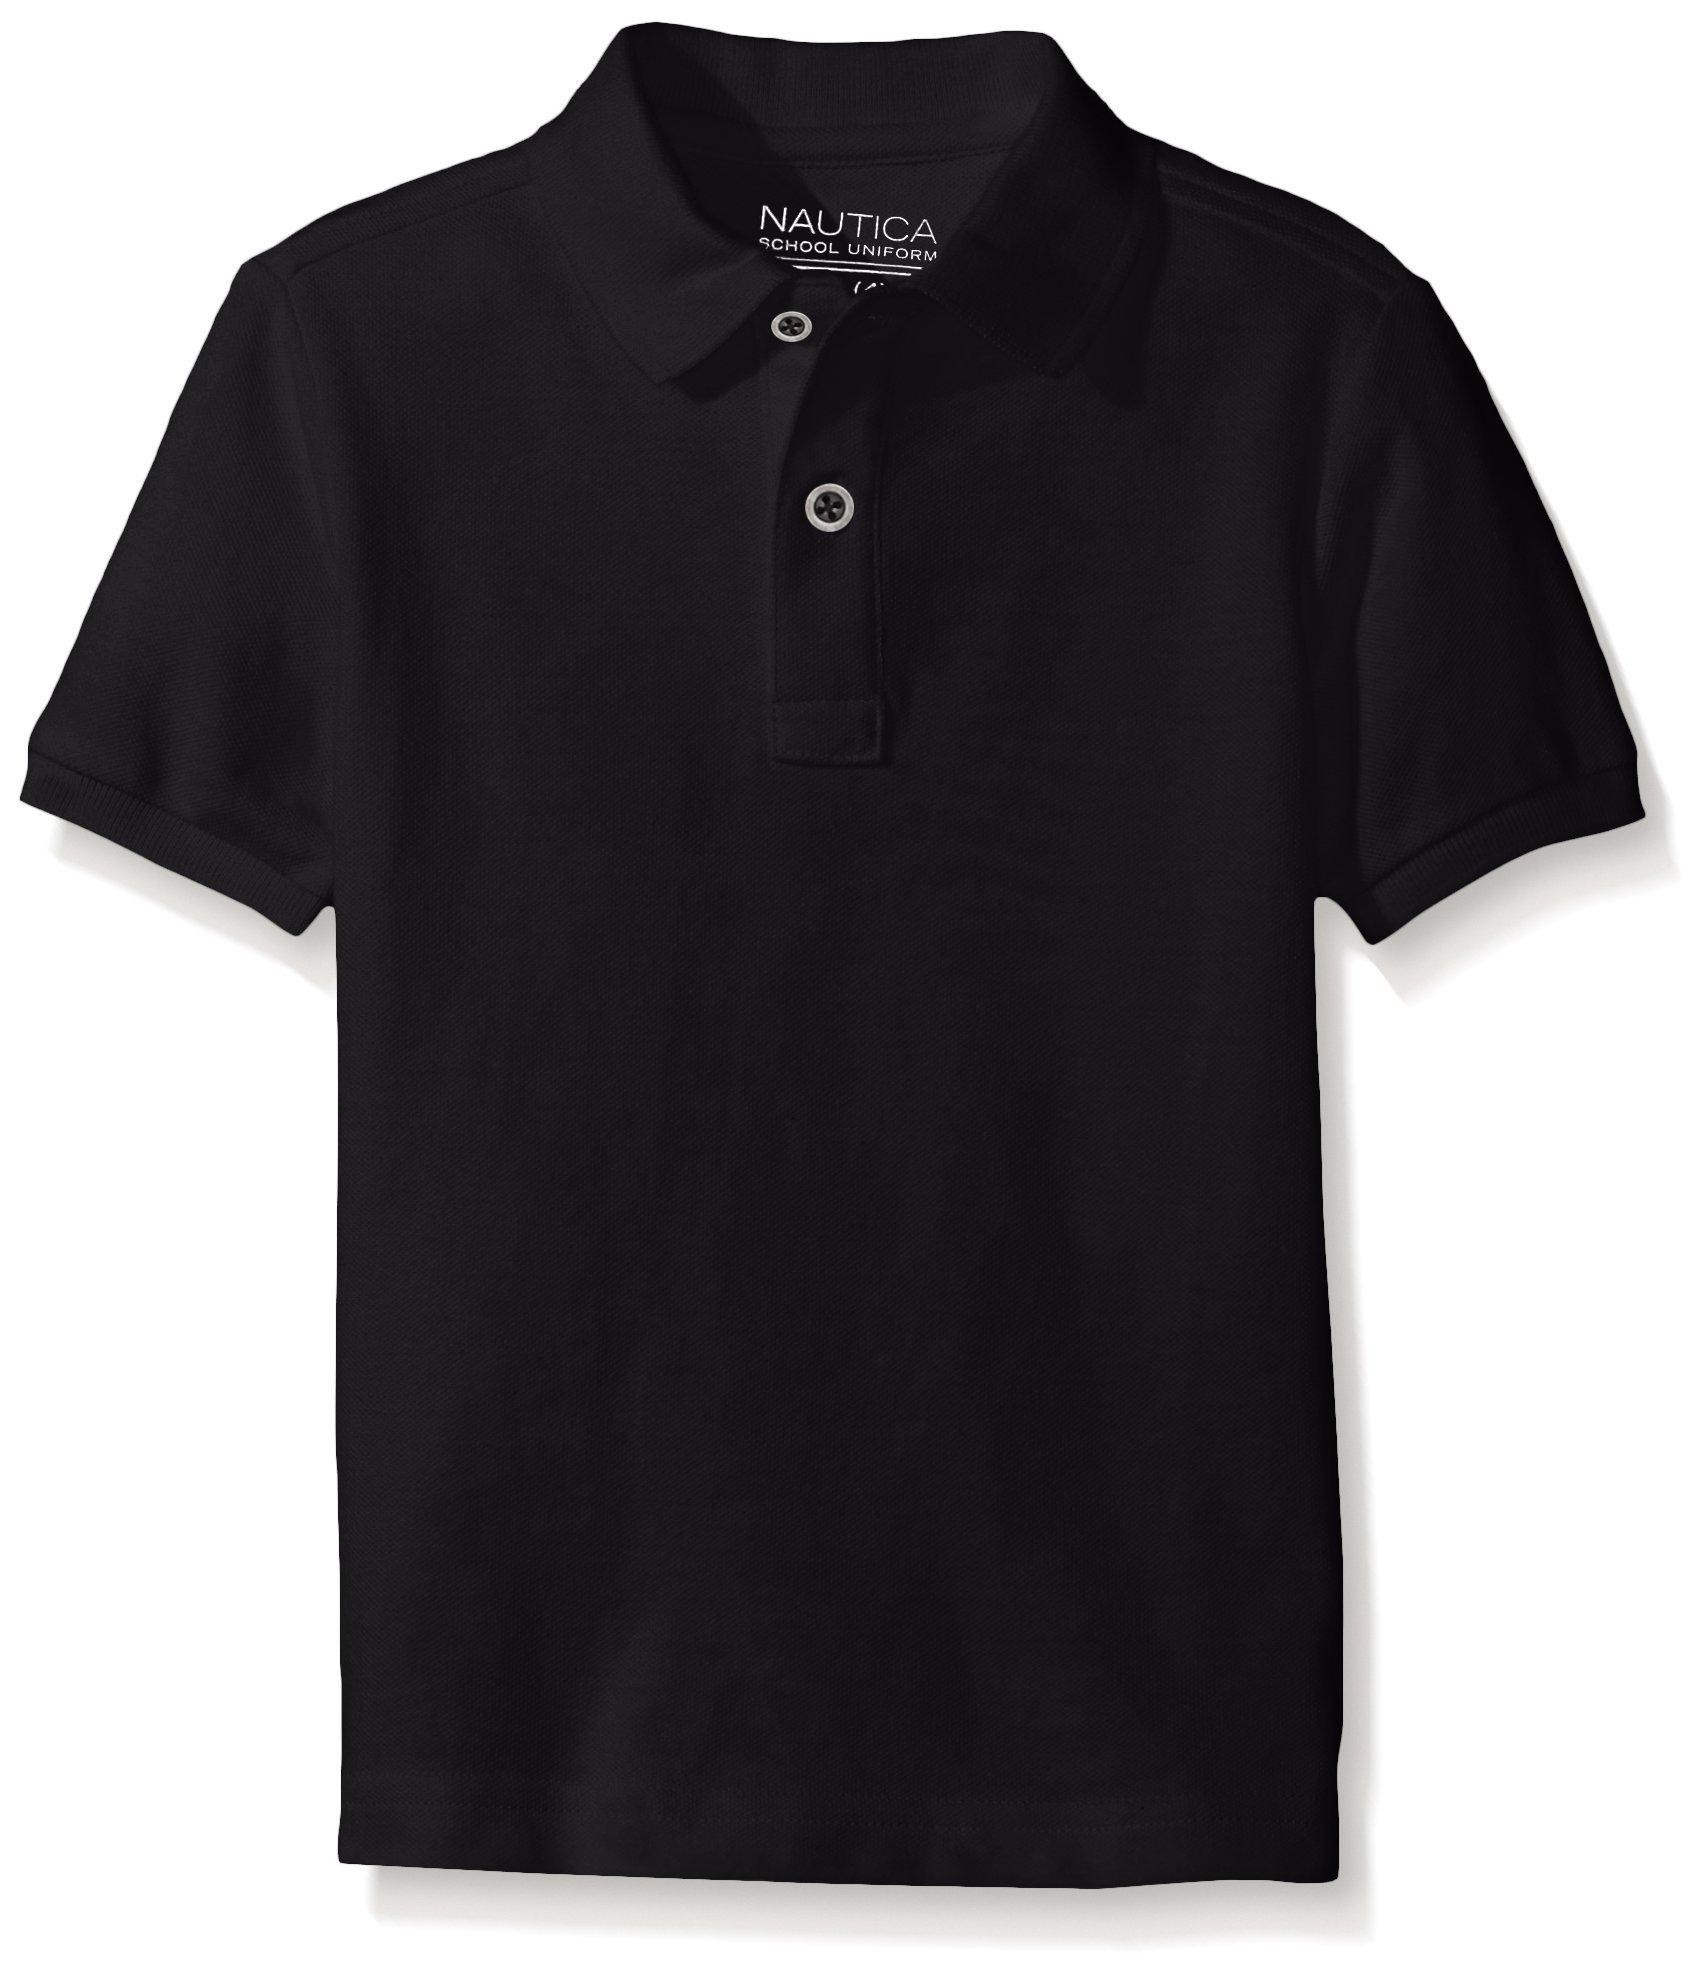 Nautica Husky Boys' Uniform Short Sleeve Pique Polo, Black, X-Large/18/20 - Husky by Nautica (Image #1)